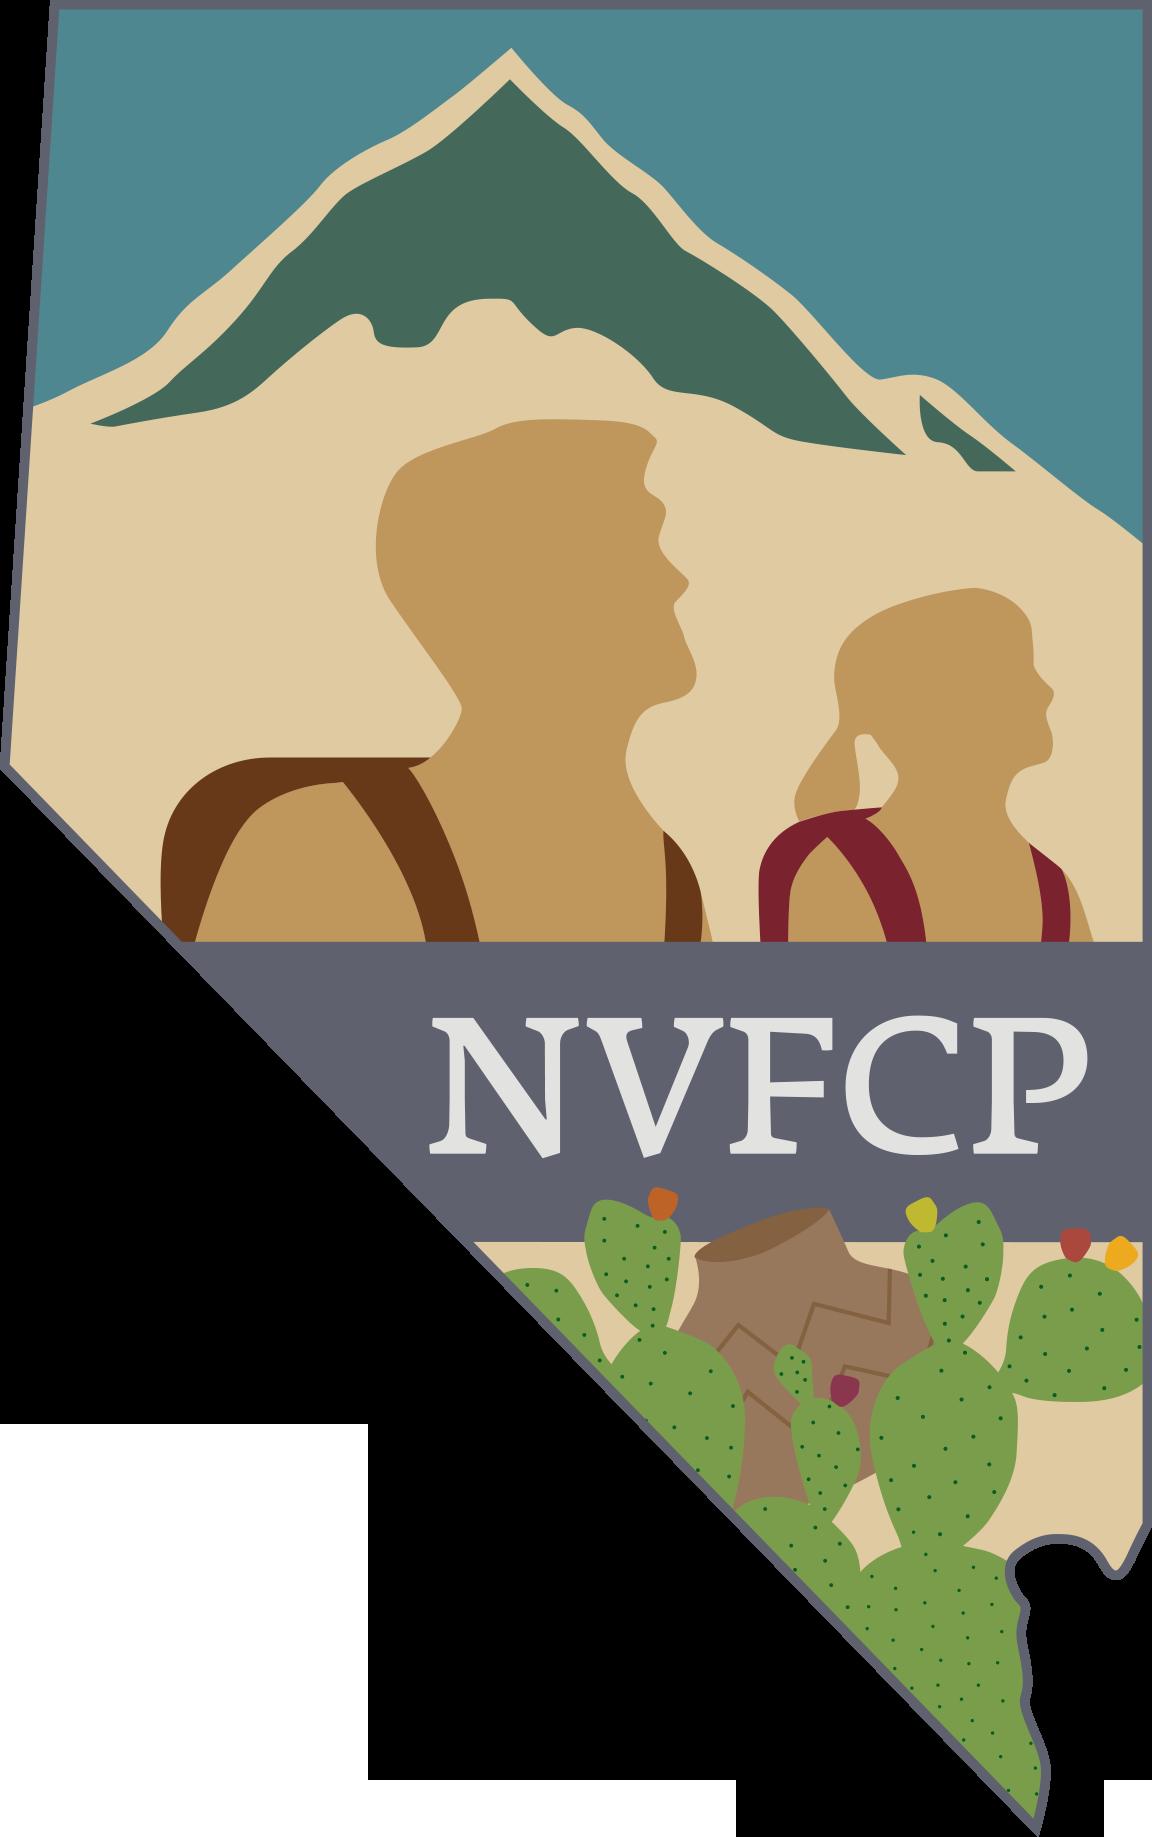 NVFCP_LG_RGB_notag_(4).png